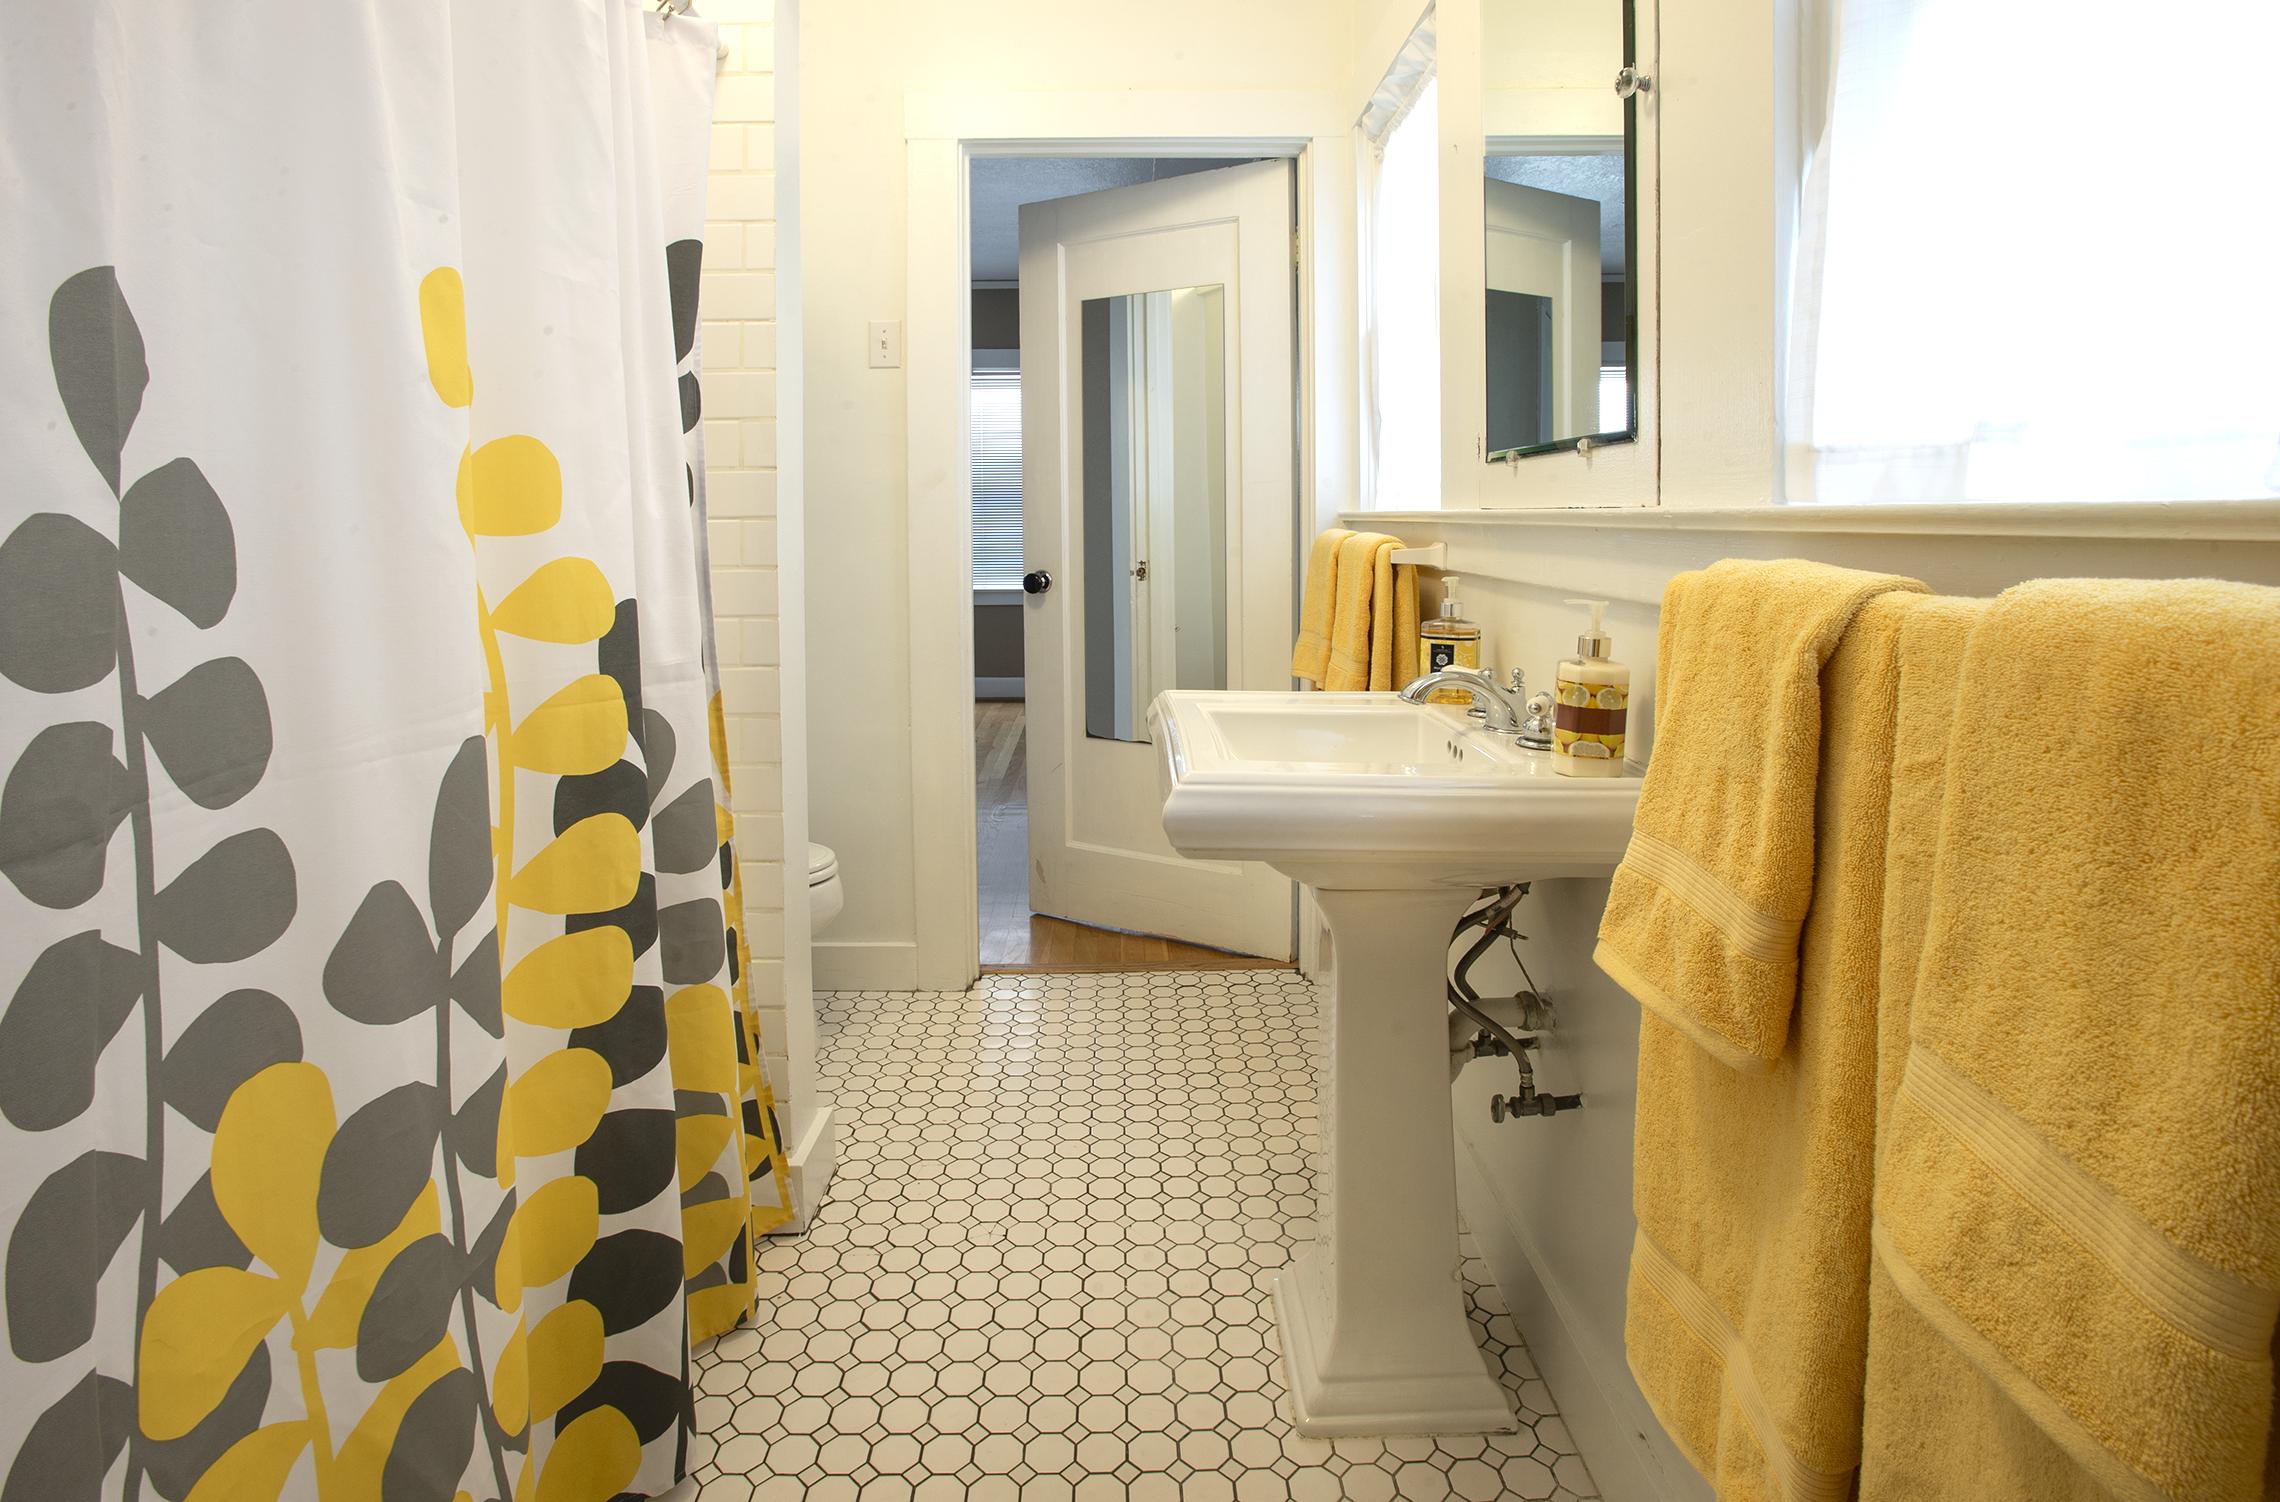 41st,Bathroom.jpg